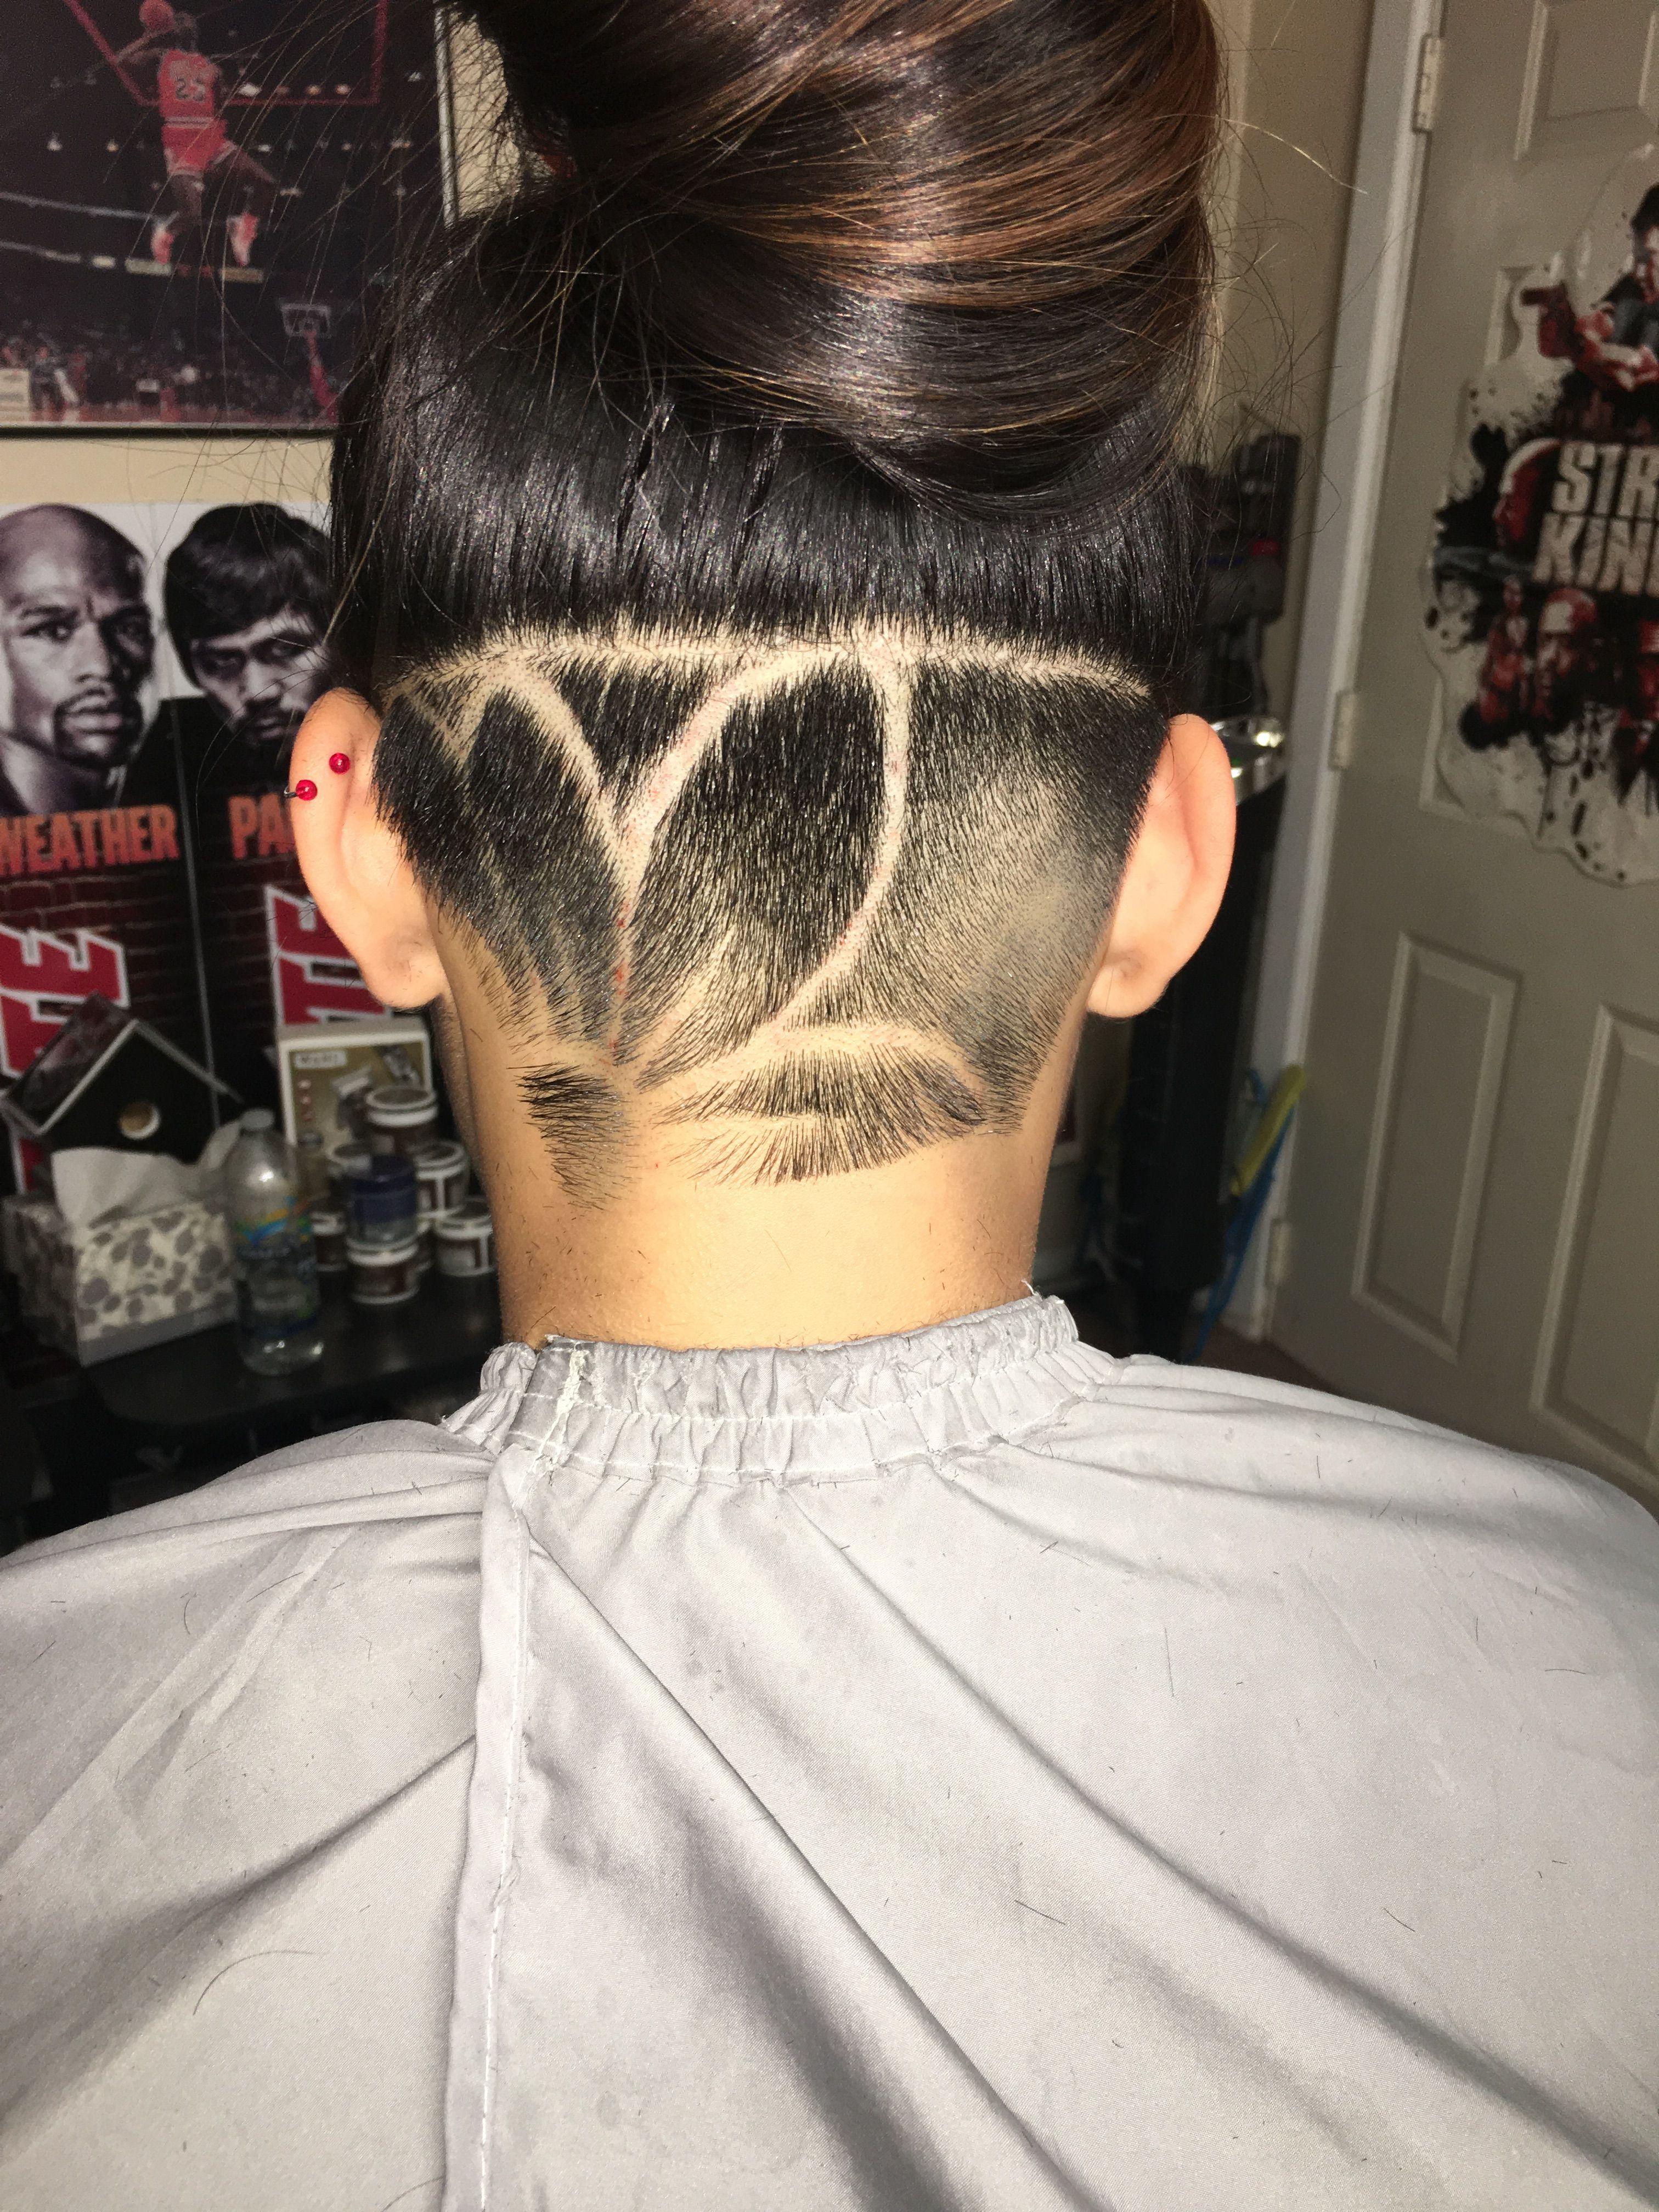 undercut #design | beauty in 2019 | undercut long hair